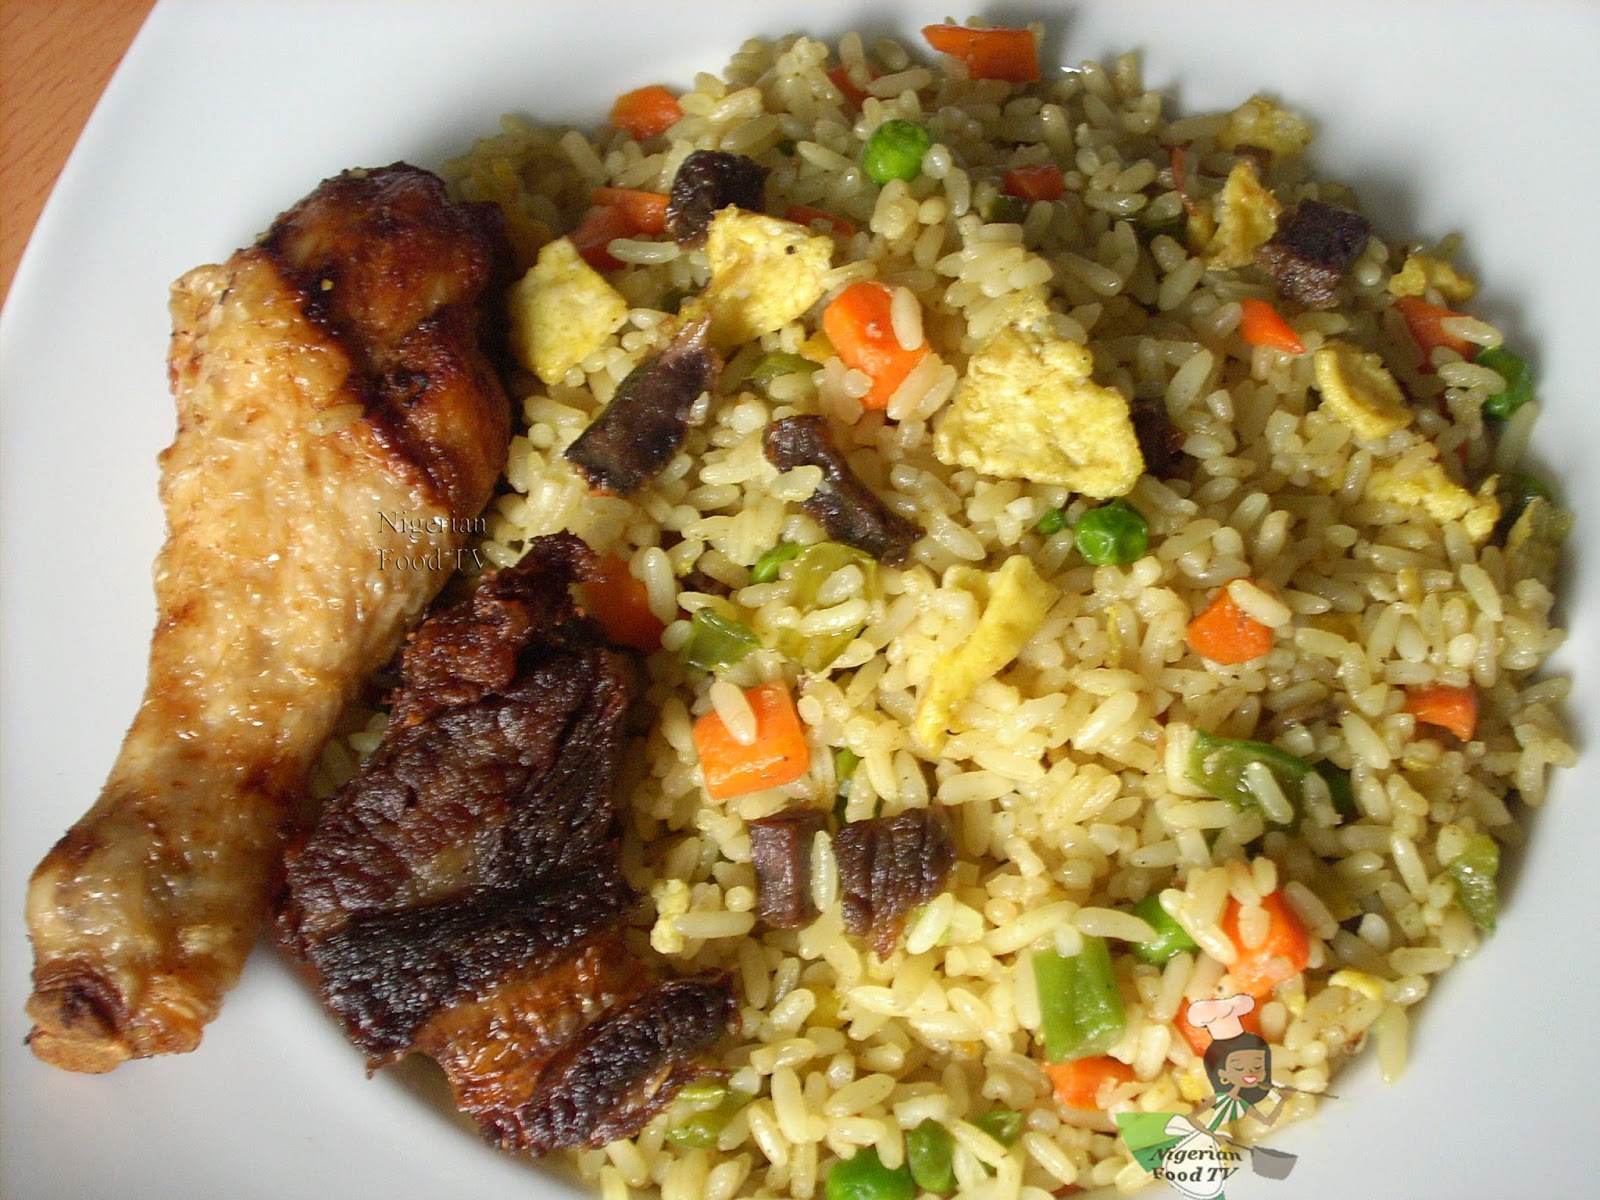 Nigerian food ,nigerian food recipe,Nigerian food recipes,Nigerian Food TV